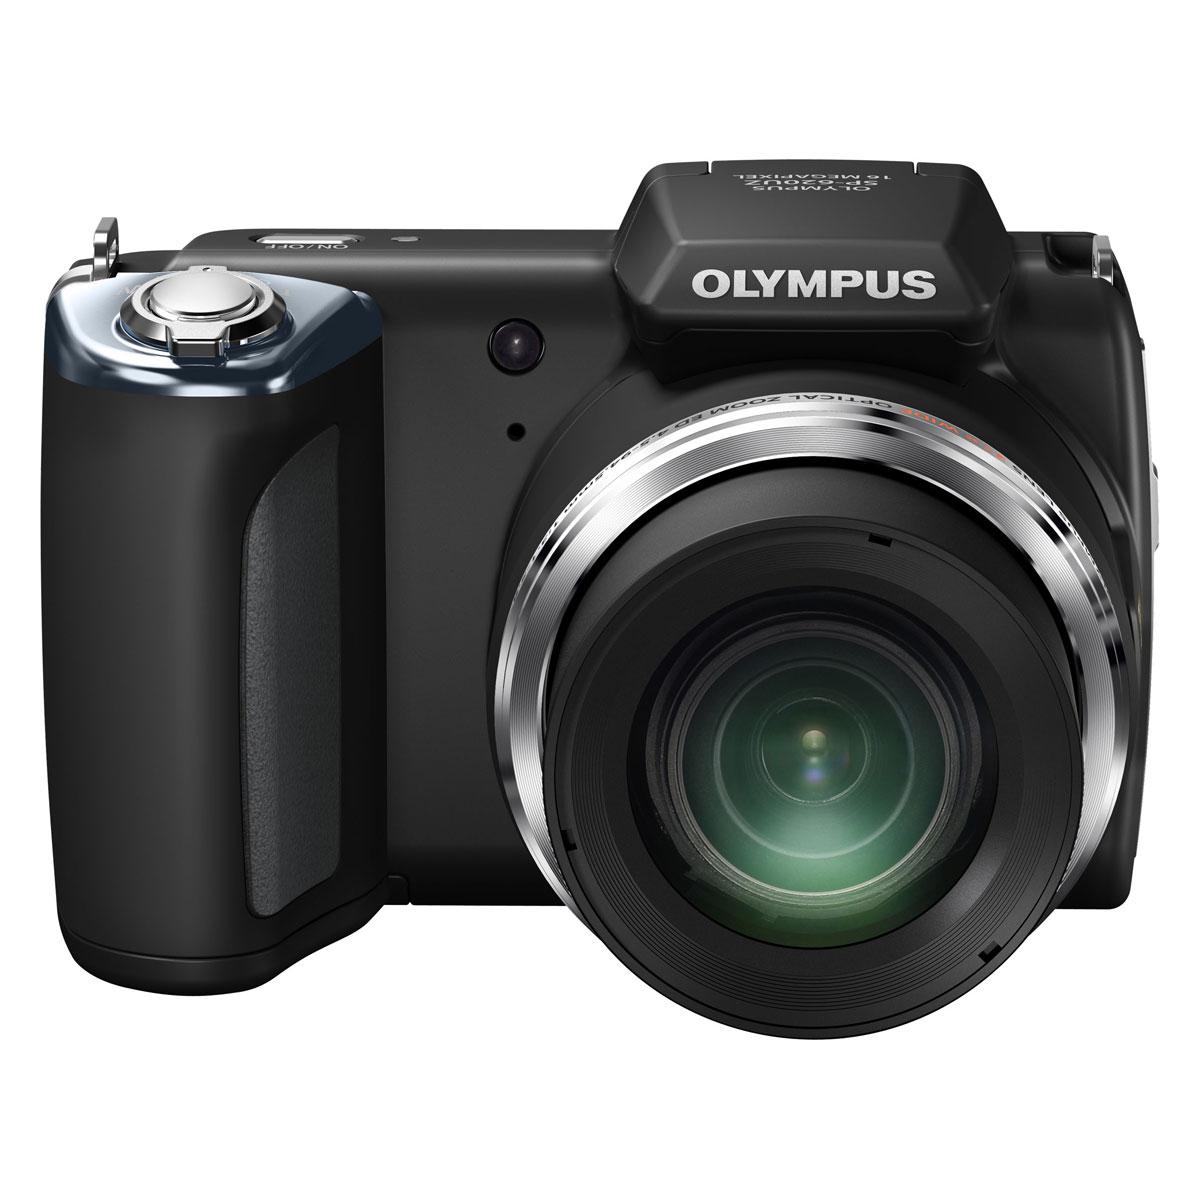 olympus sp 620uz noir appareil photo num rique olympus sur. Black Bedroom Furniture Sets. Home Design Ideas